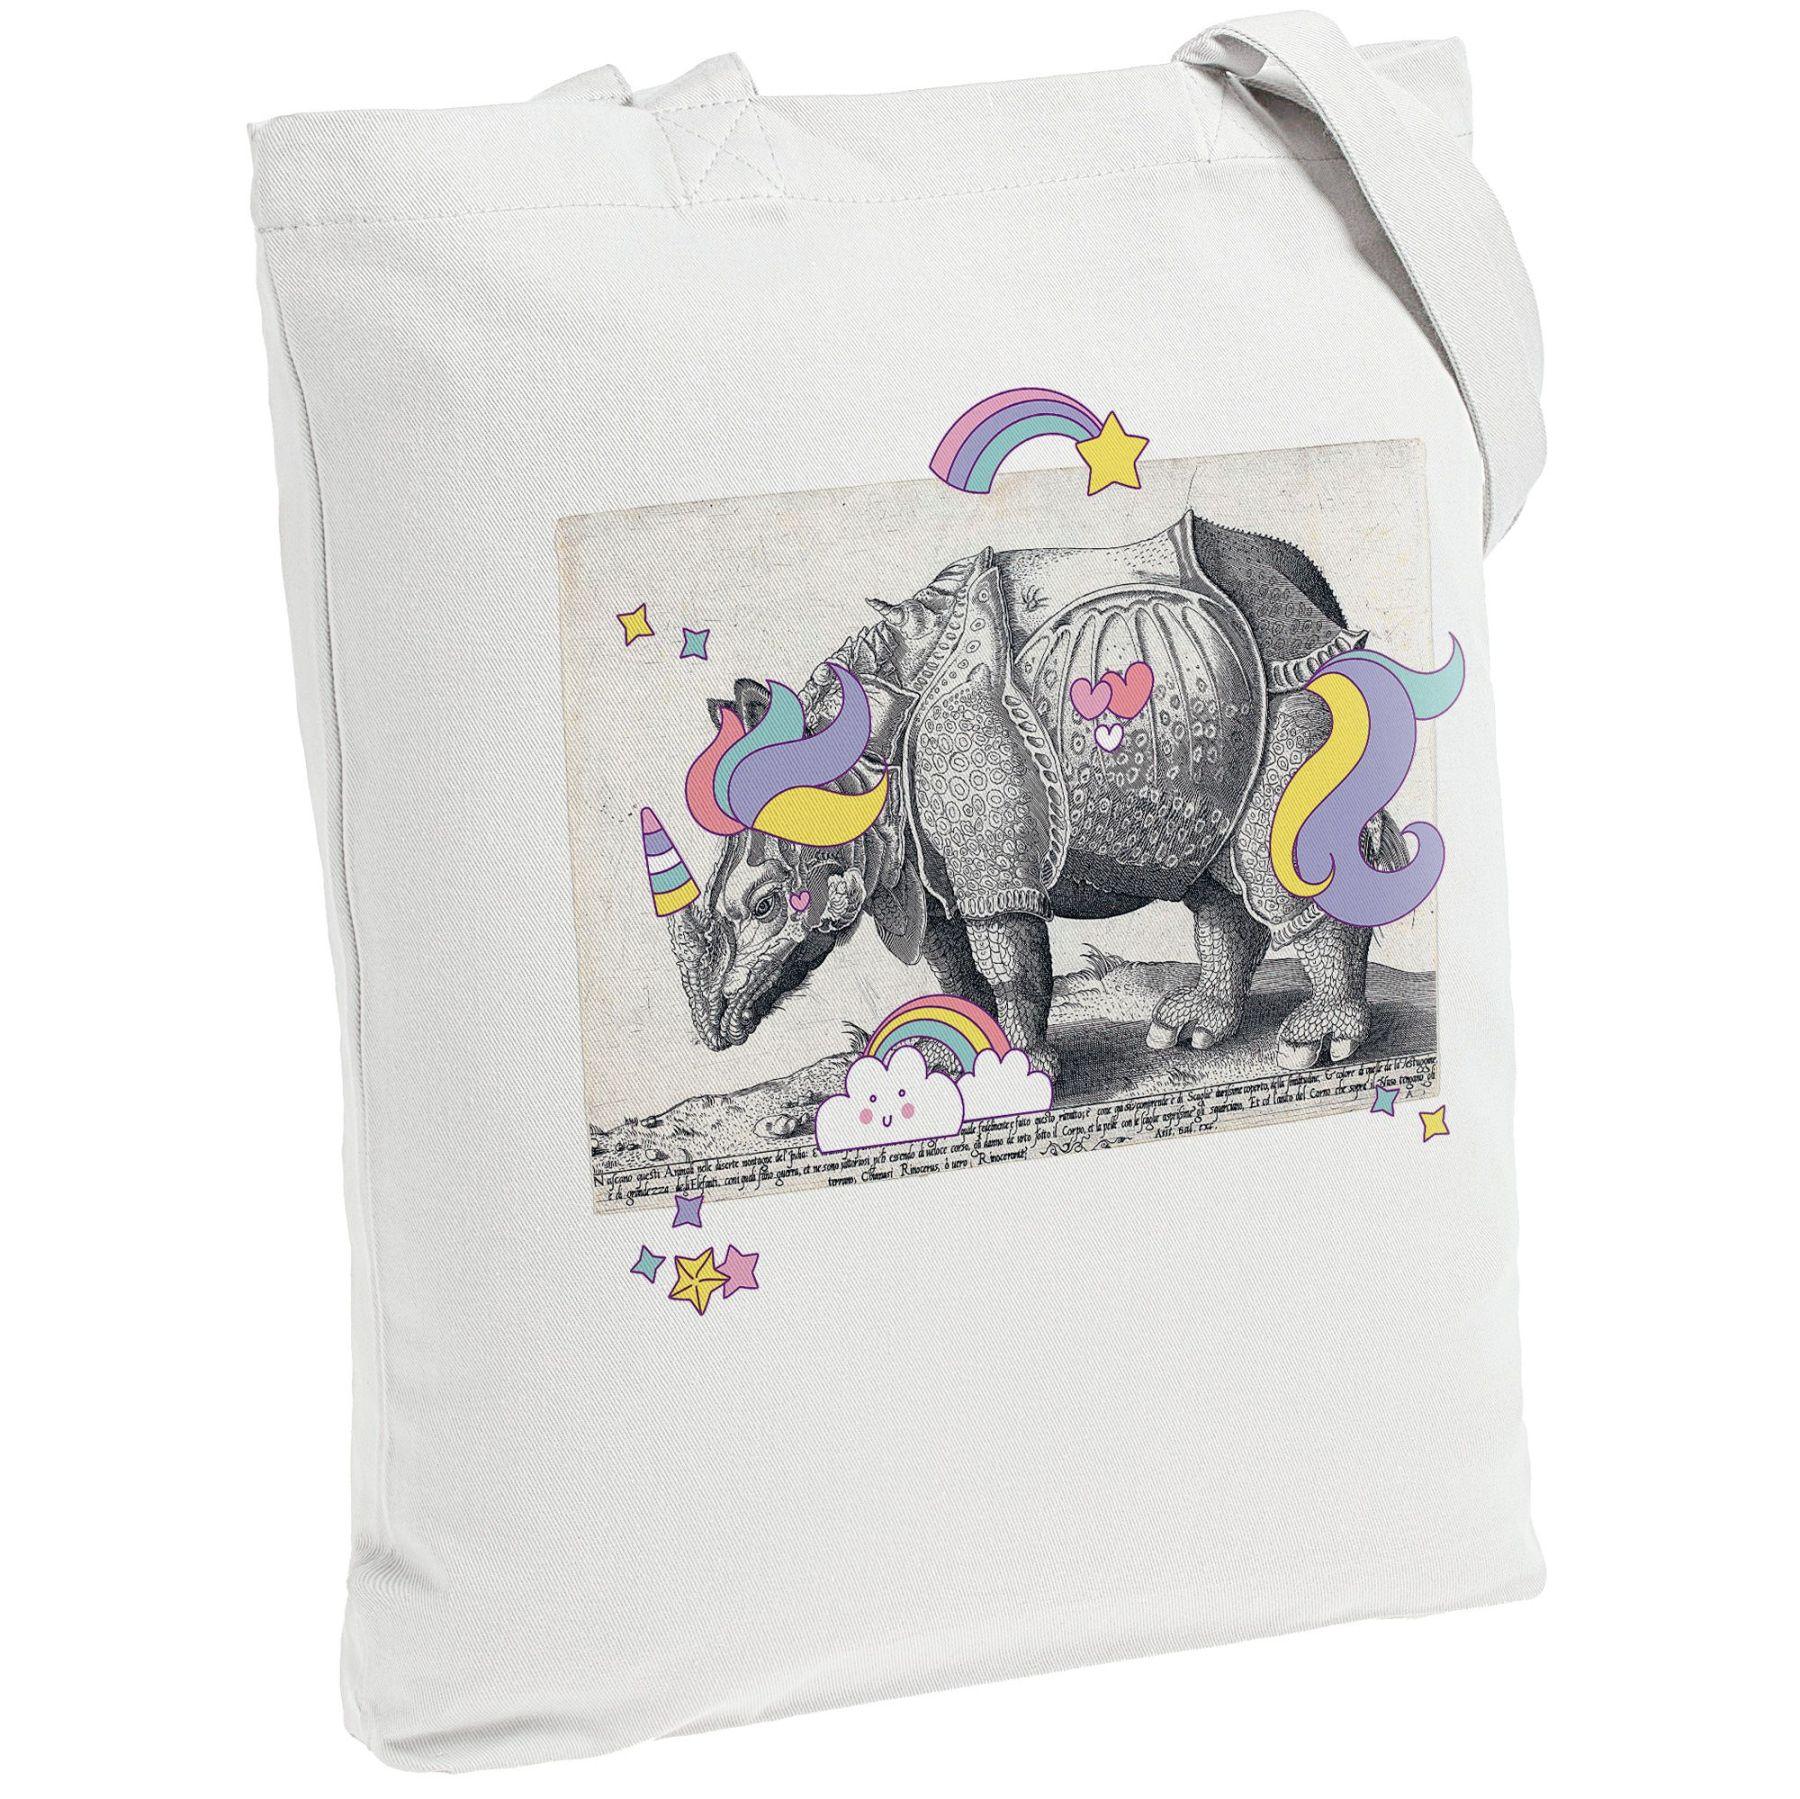 Sueño grande bolsa de lona unisex respetuoso del medio ambiente bolsa de hombro de moda bolso espacioso bolsa reutilizable bolsa bolso shopper bolsa bolso de algodón bolsa Eco de alta calidad Lino algodón material